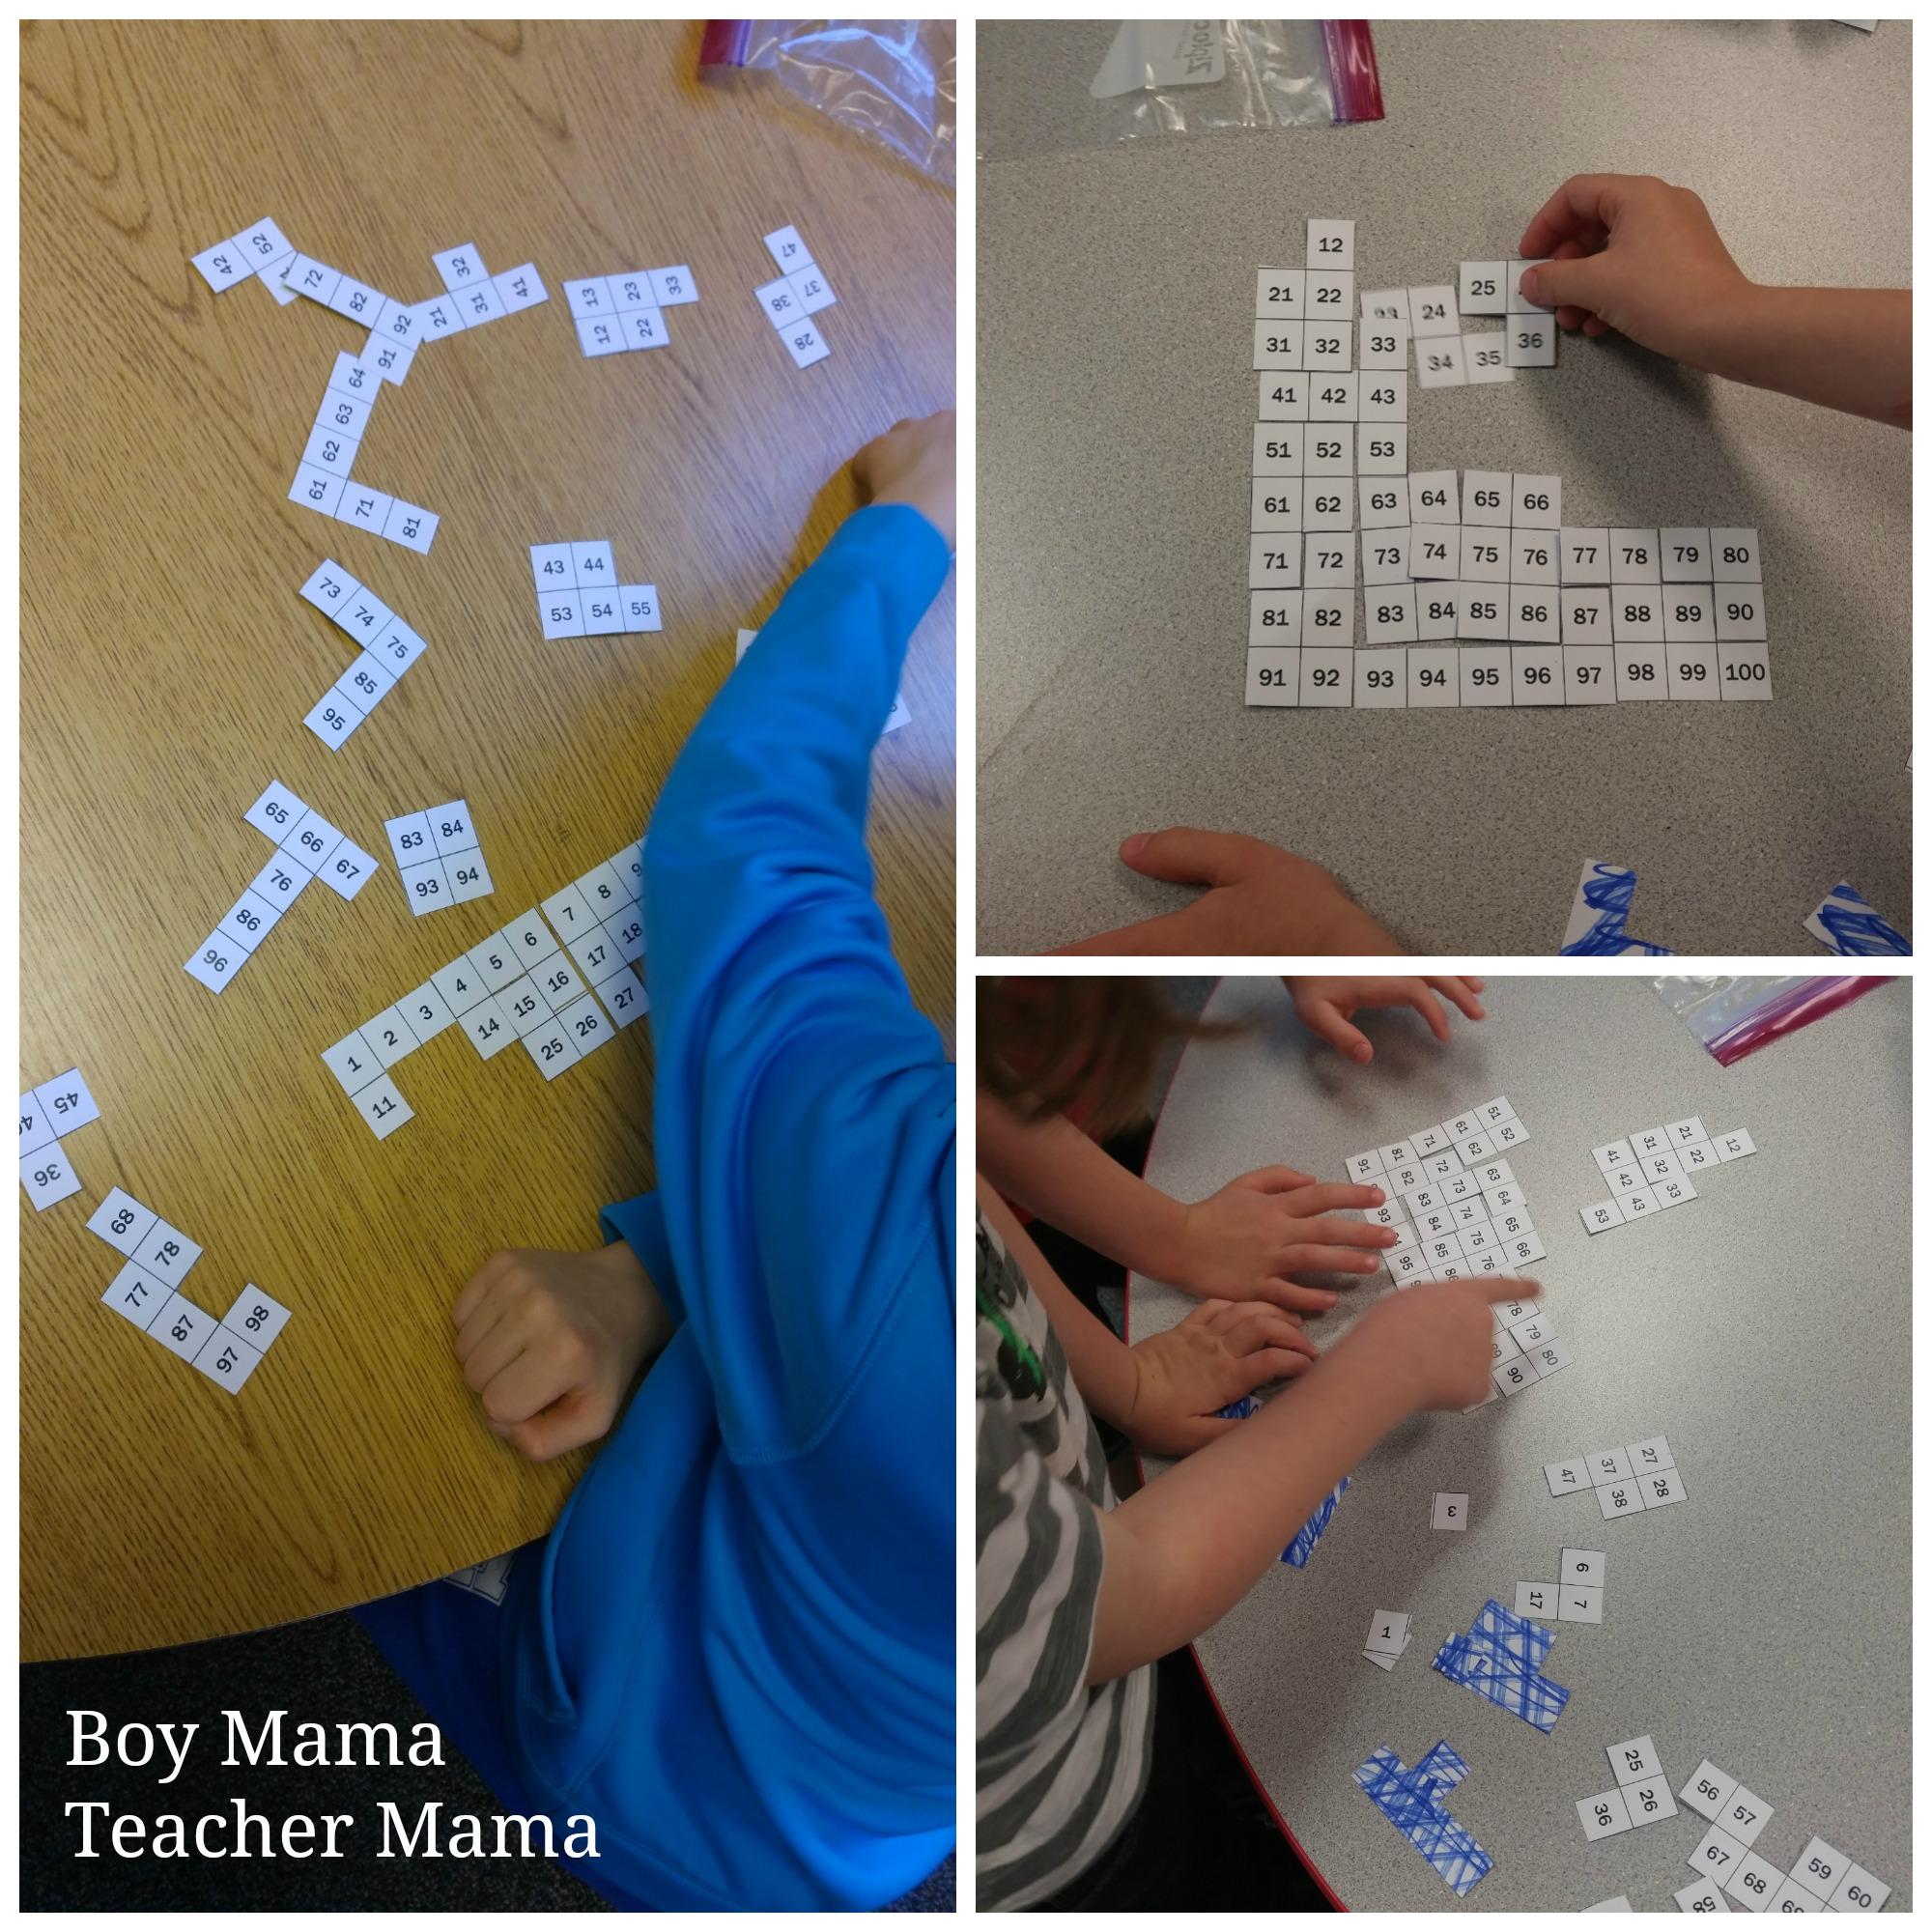 Boy Mama Teacher Mama 100s Chart Puzzles 3